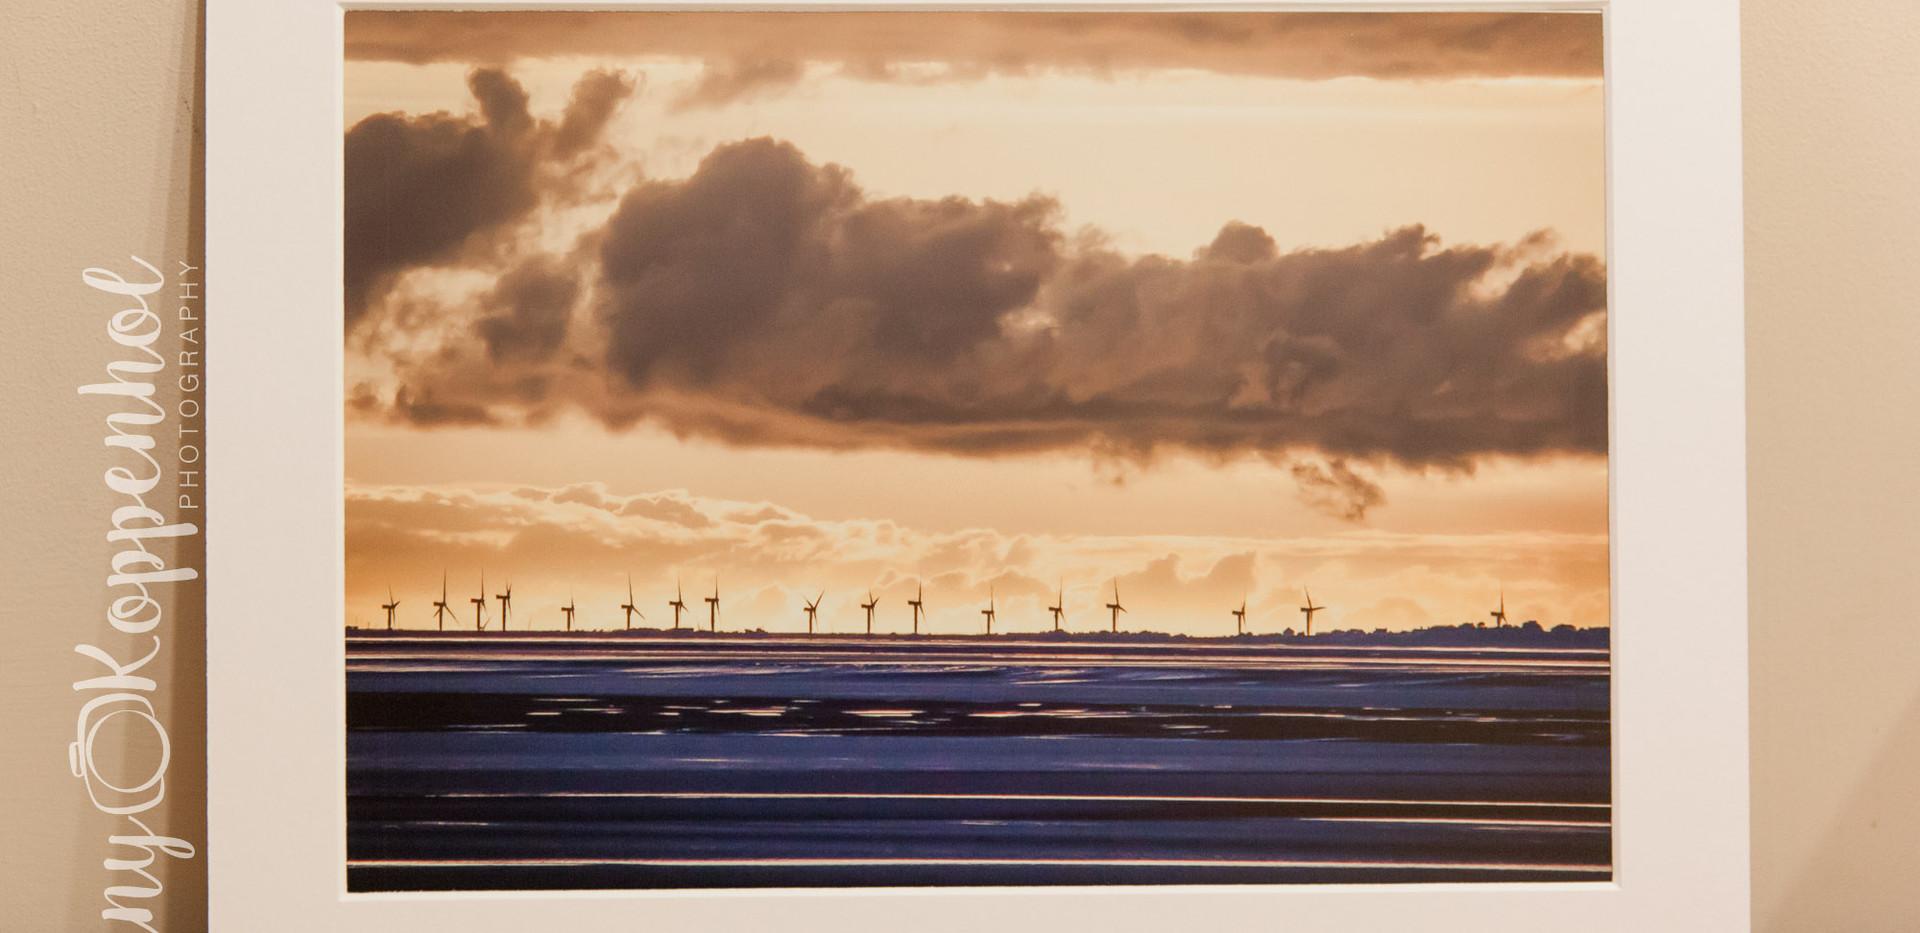 Windmills from Heysham Battery